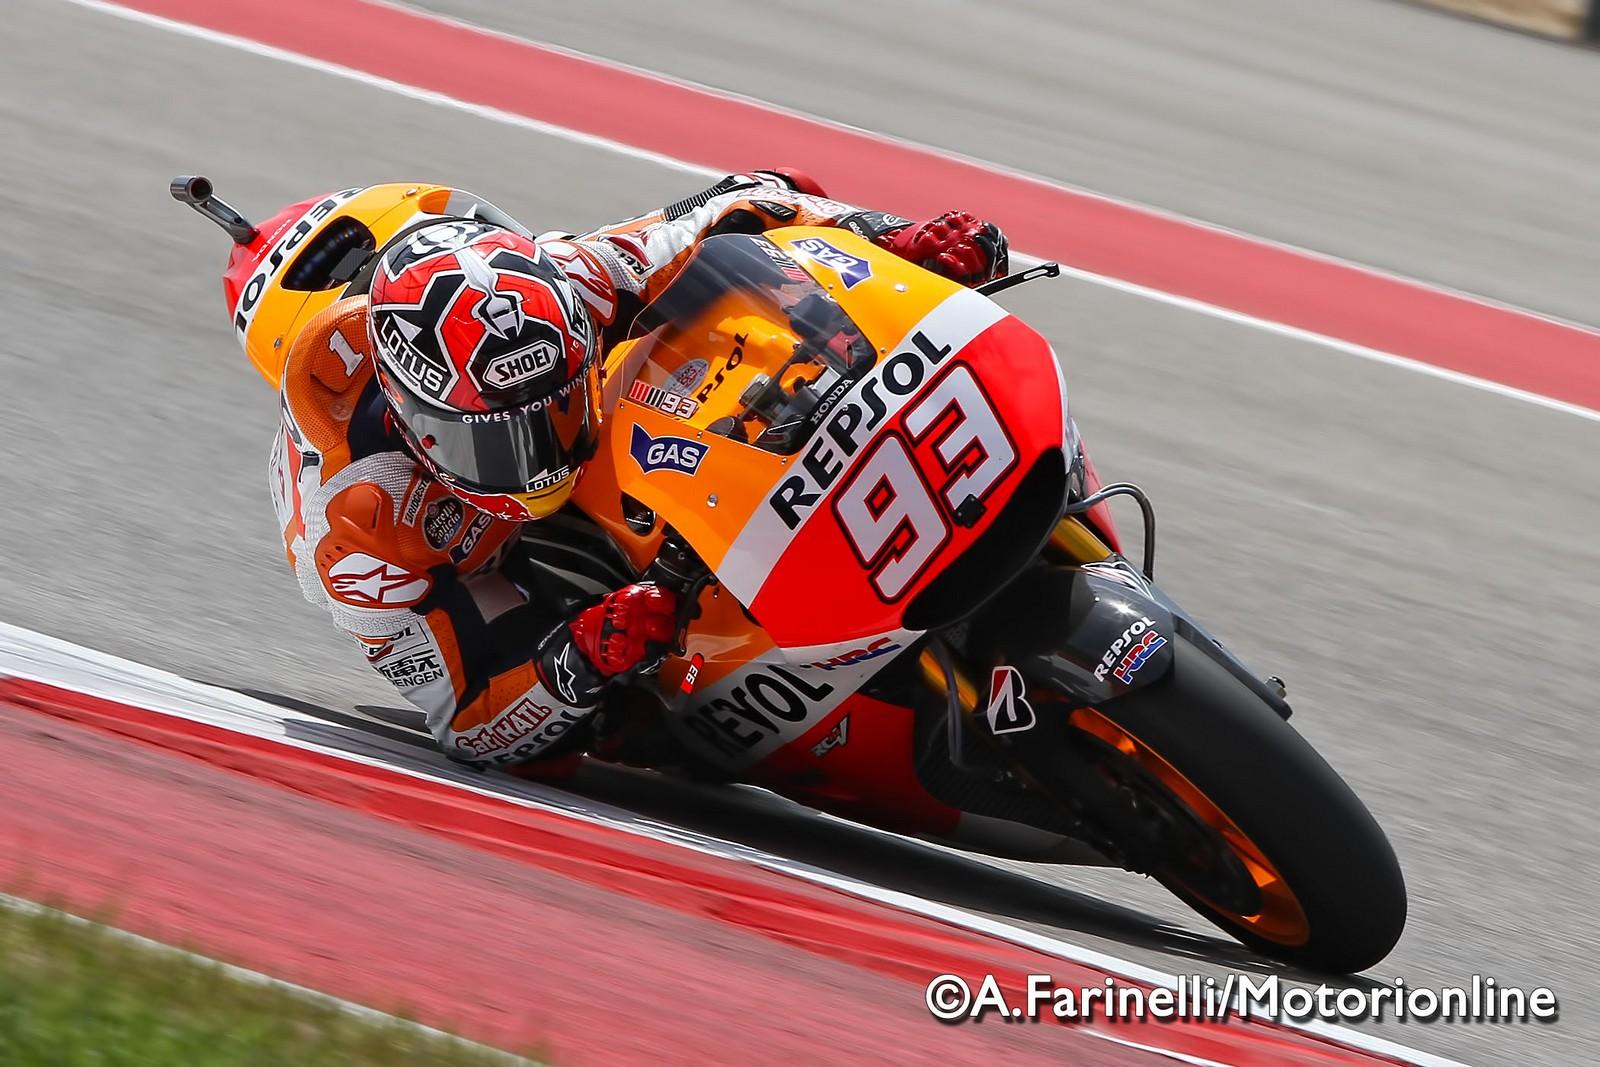 MotoGP Austin 2014Day_2 Foto MotoGP alta risoluzione 10 di 59